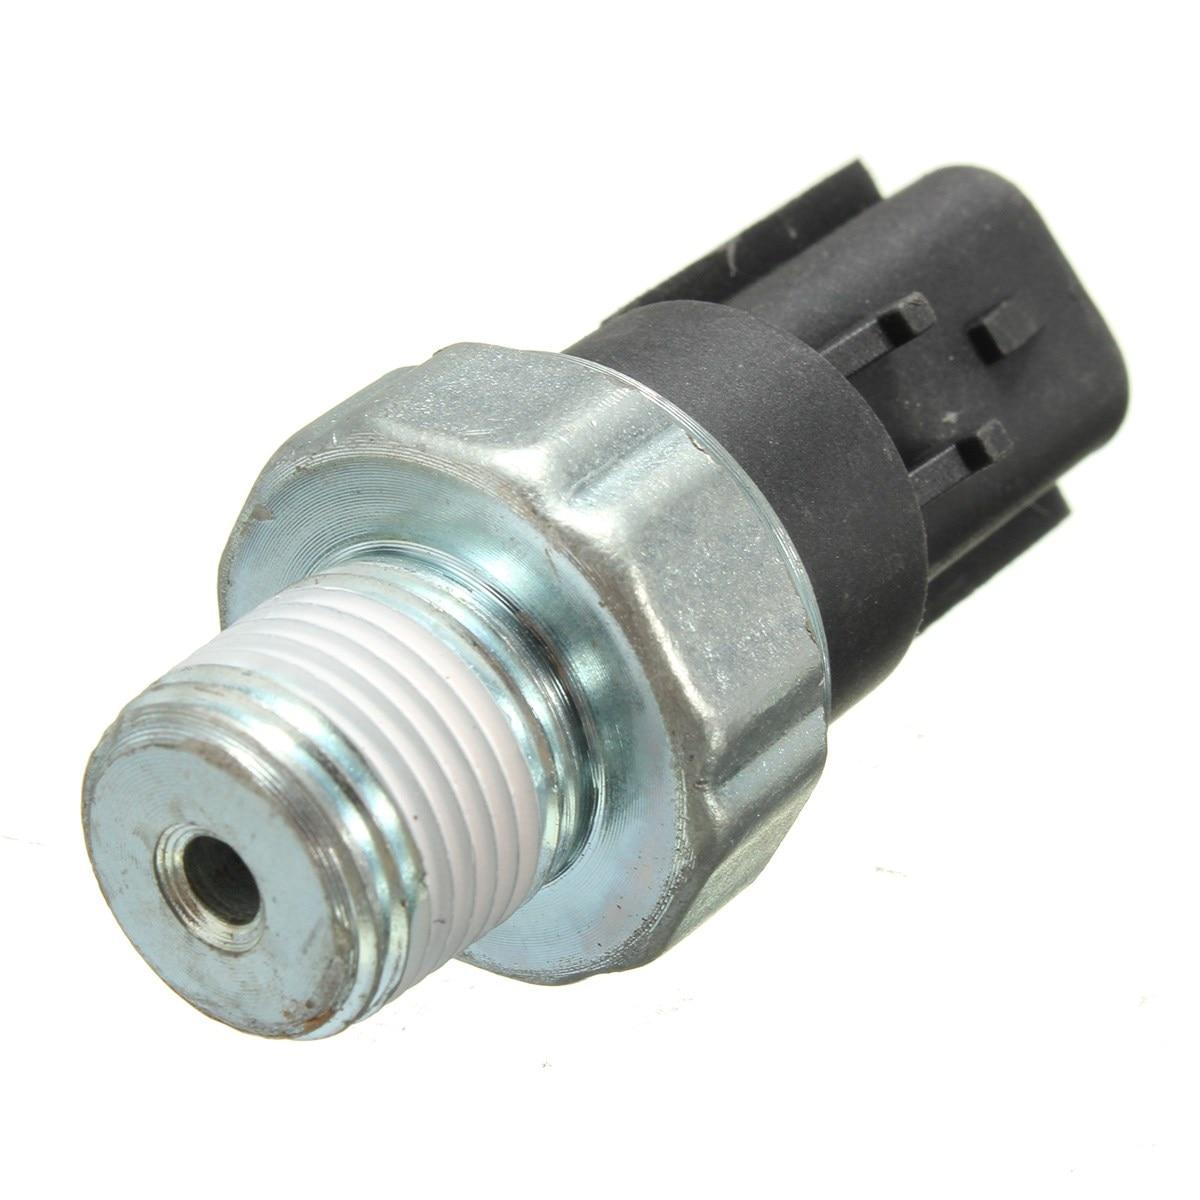 car auto engine oil pressure sensor switch for chrysler dodge jeep ps287  [ 1200 x 1200 Pixel ]